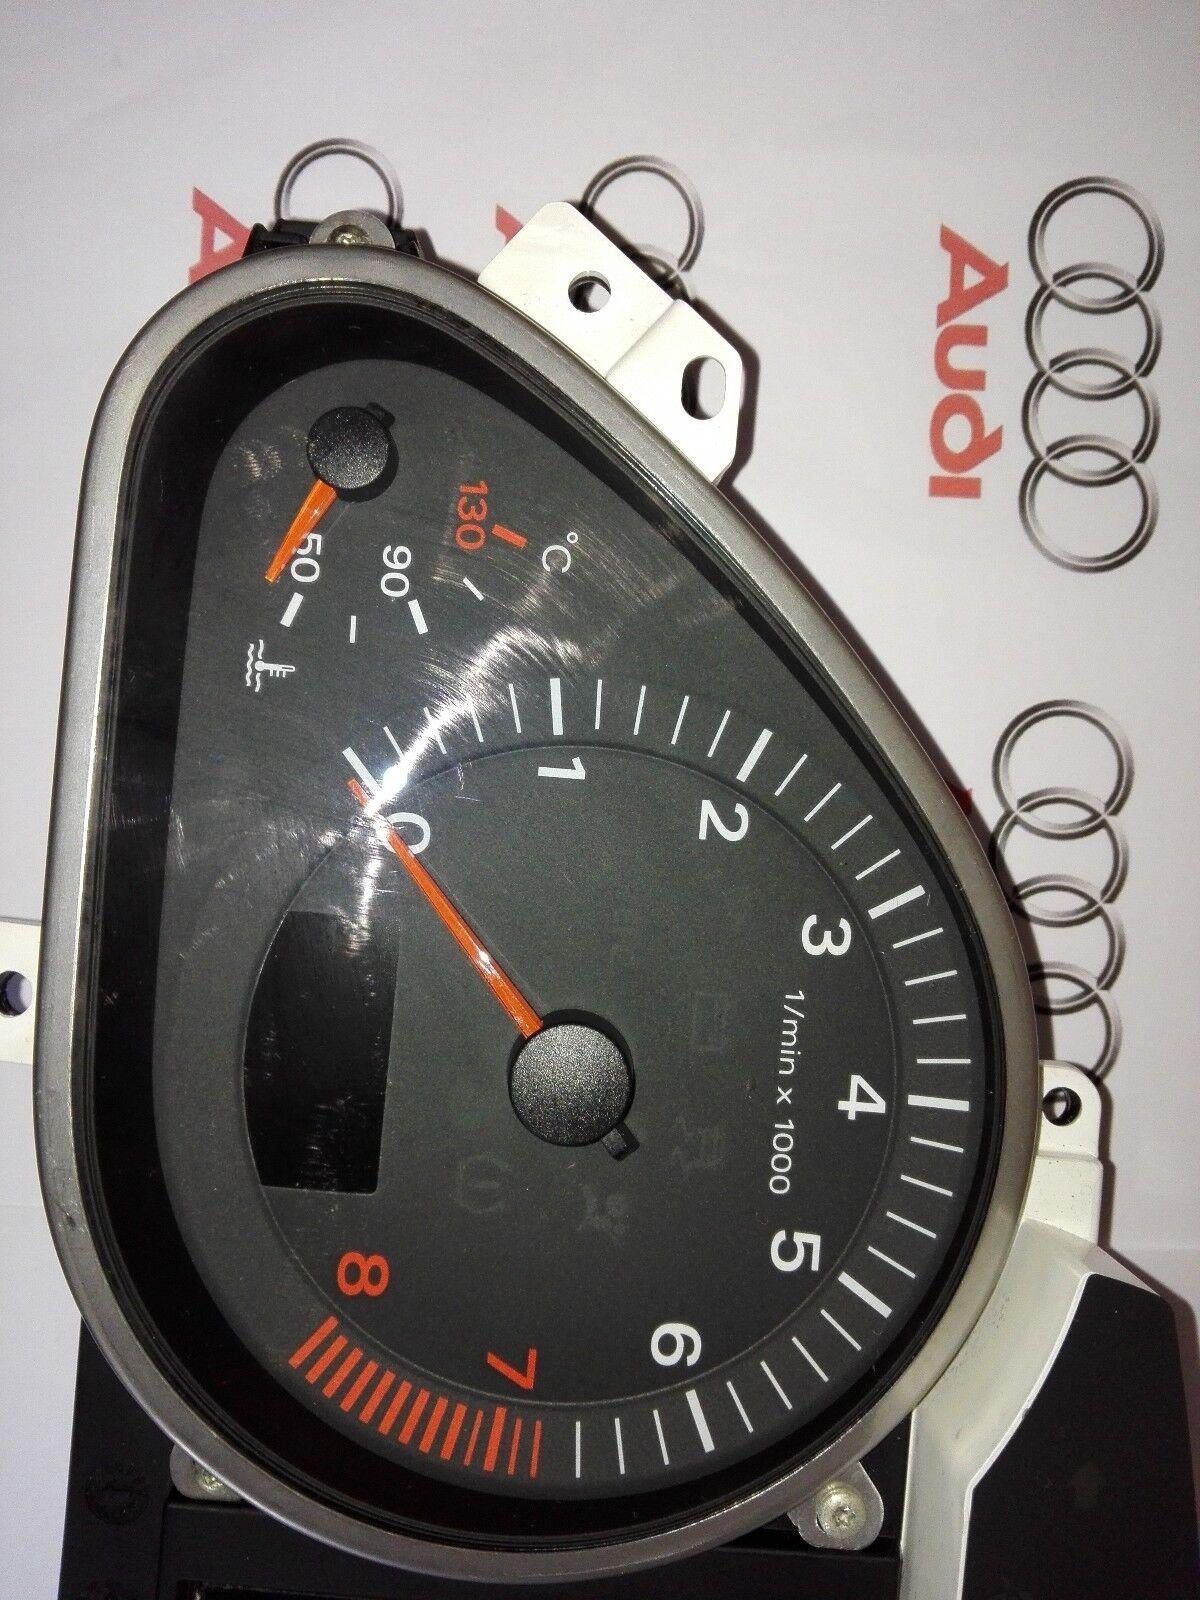 Used Audi A6 Quattro Gauges For Sale Vdo Tachometer Wiring Diagram 1 Min C6 2007 32 Fsi Instrument Cluster Clock Speedometer 4f0920950g